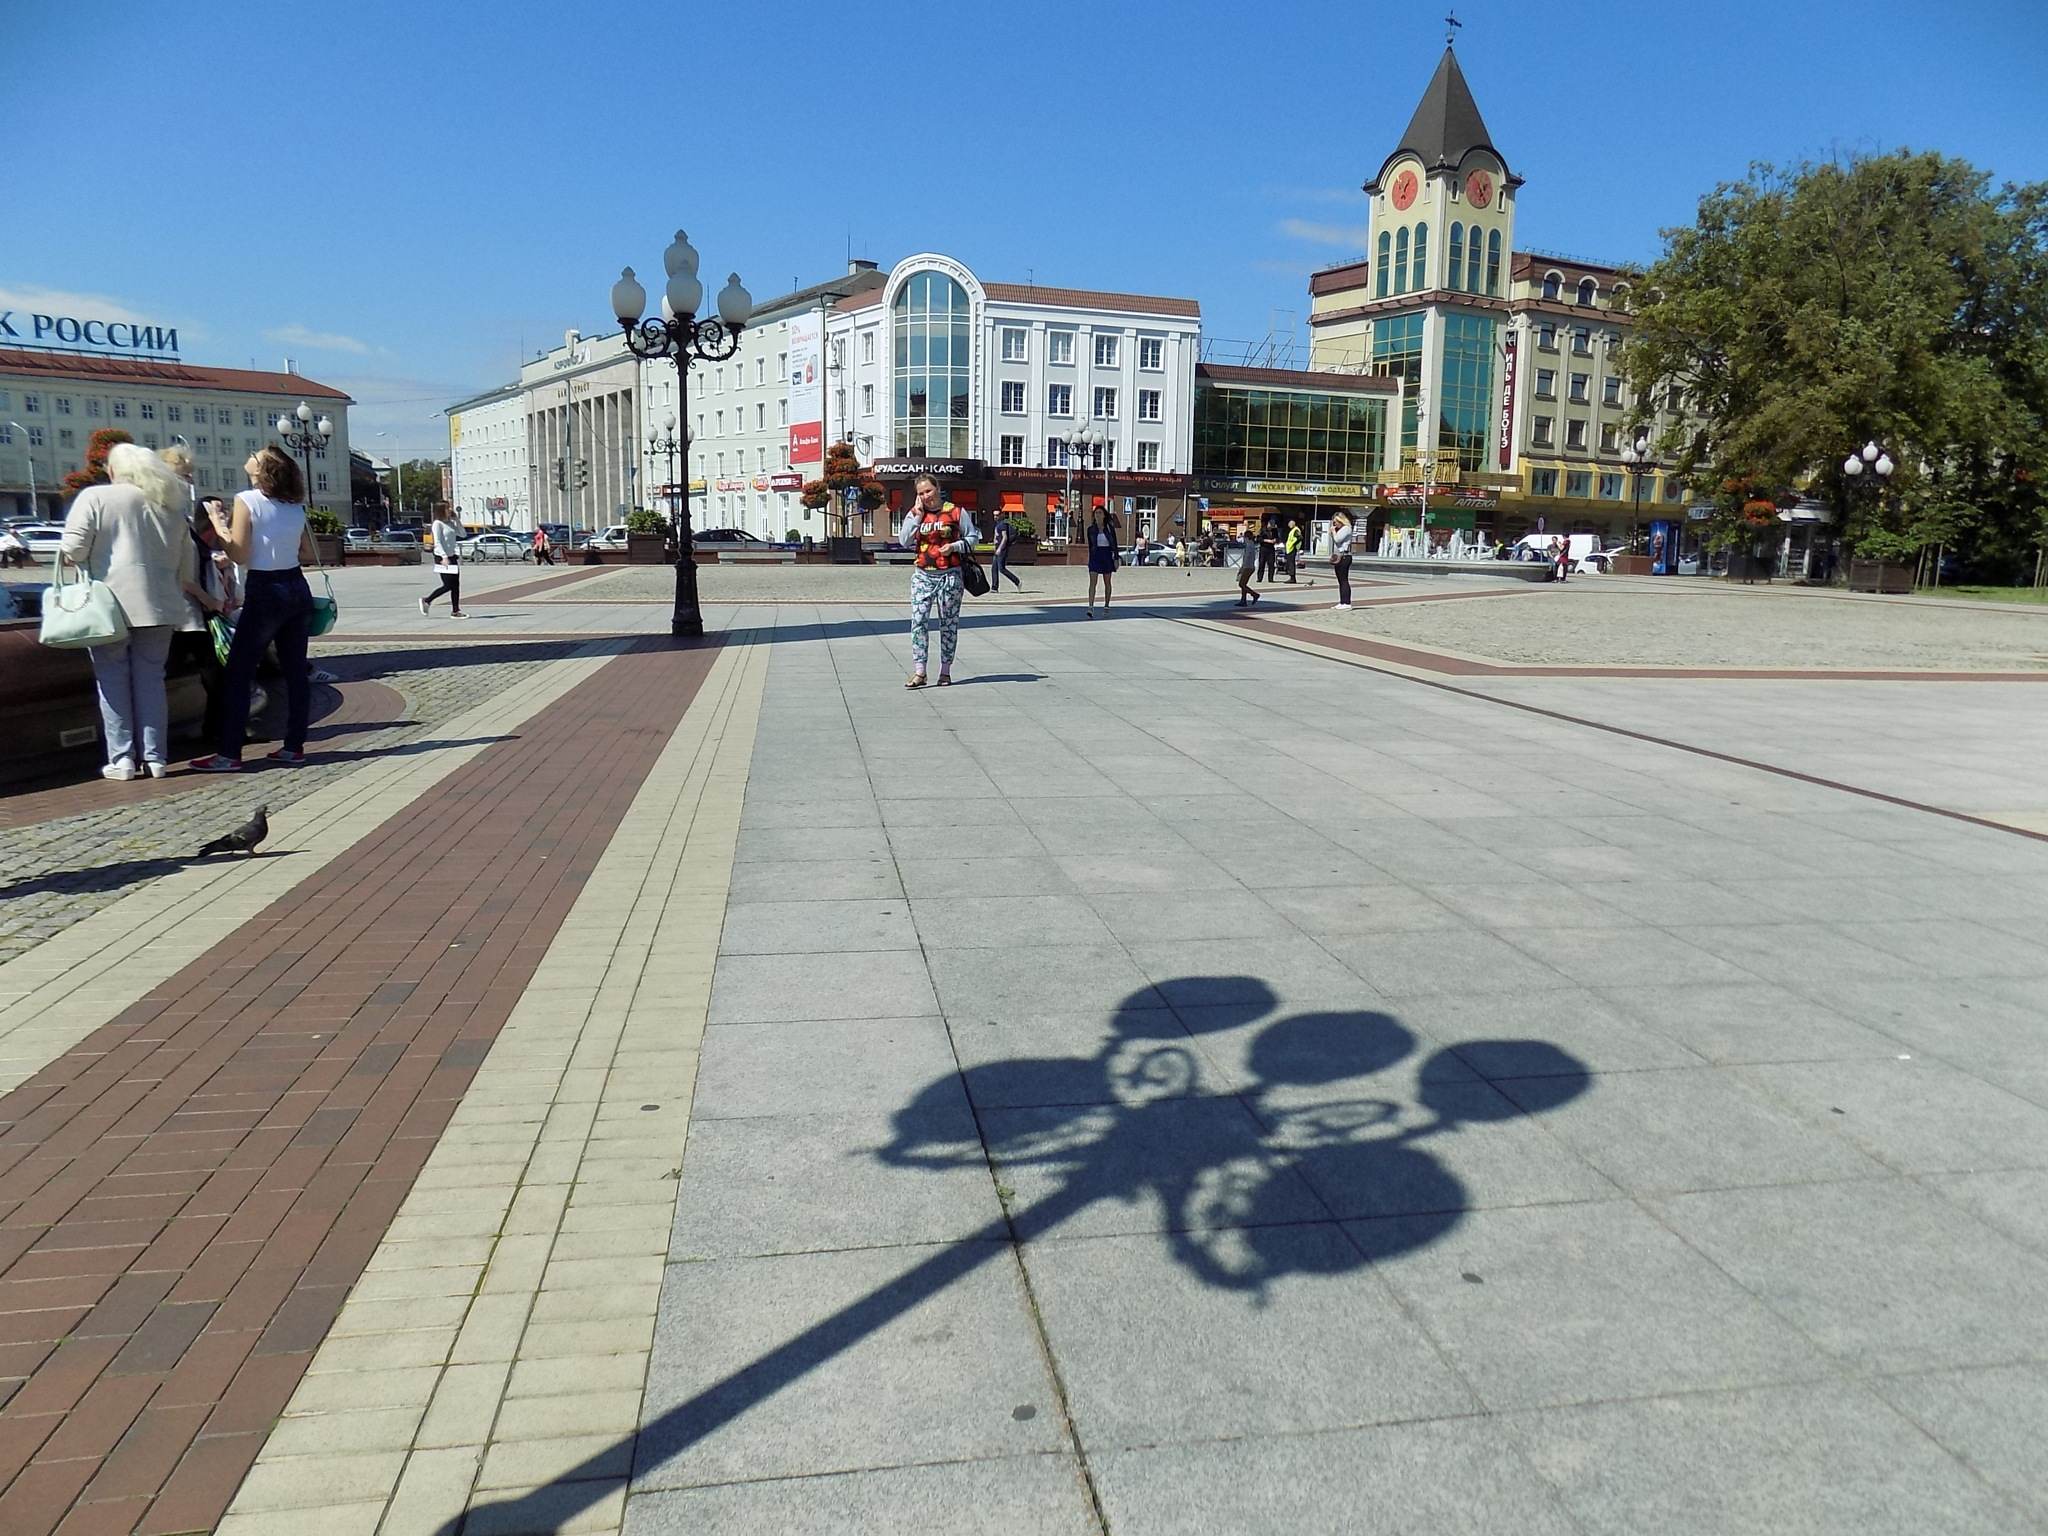 In the city by uzkuraitiene62